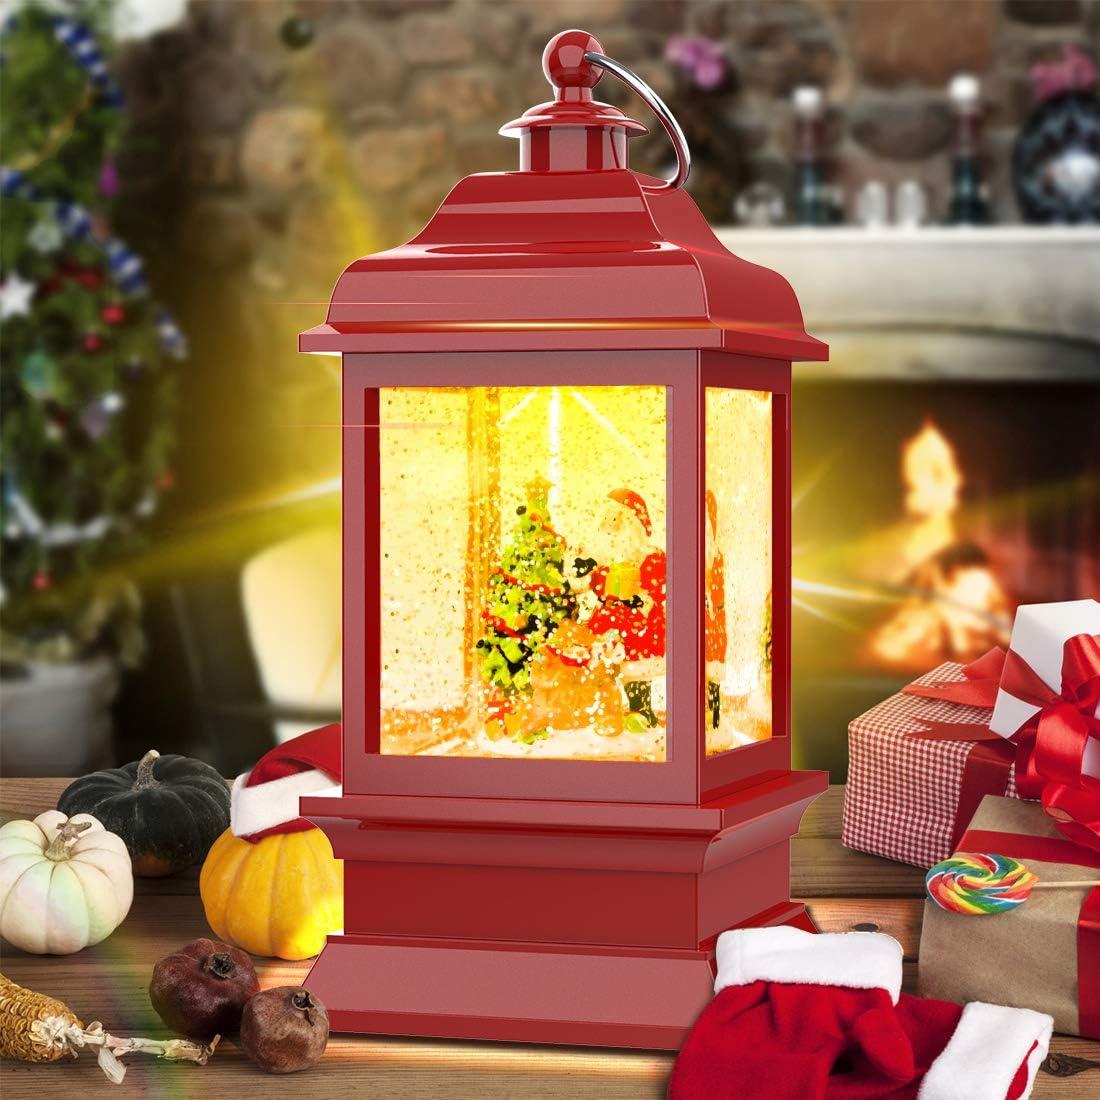 Retro Arch Bridge Frame Candle Night Light Swirling Glittering Snow Globe Lantern Xmas Decorative Lamp Festival Ornament and Gifts Suweor Upo Christmas Lighted Water Lantern